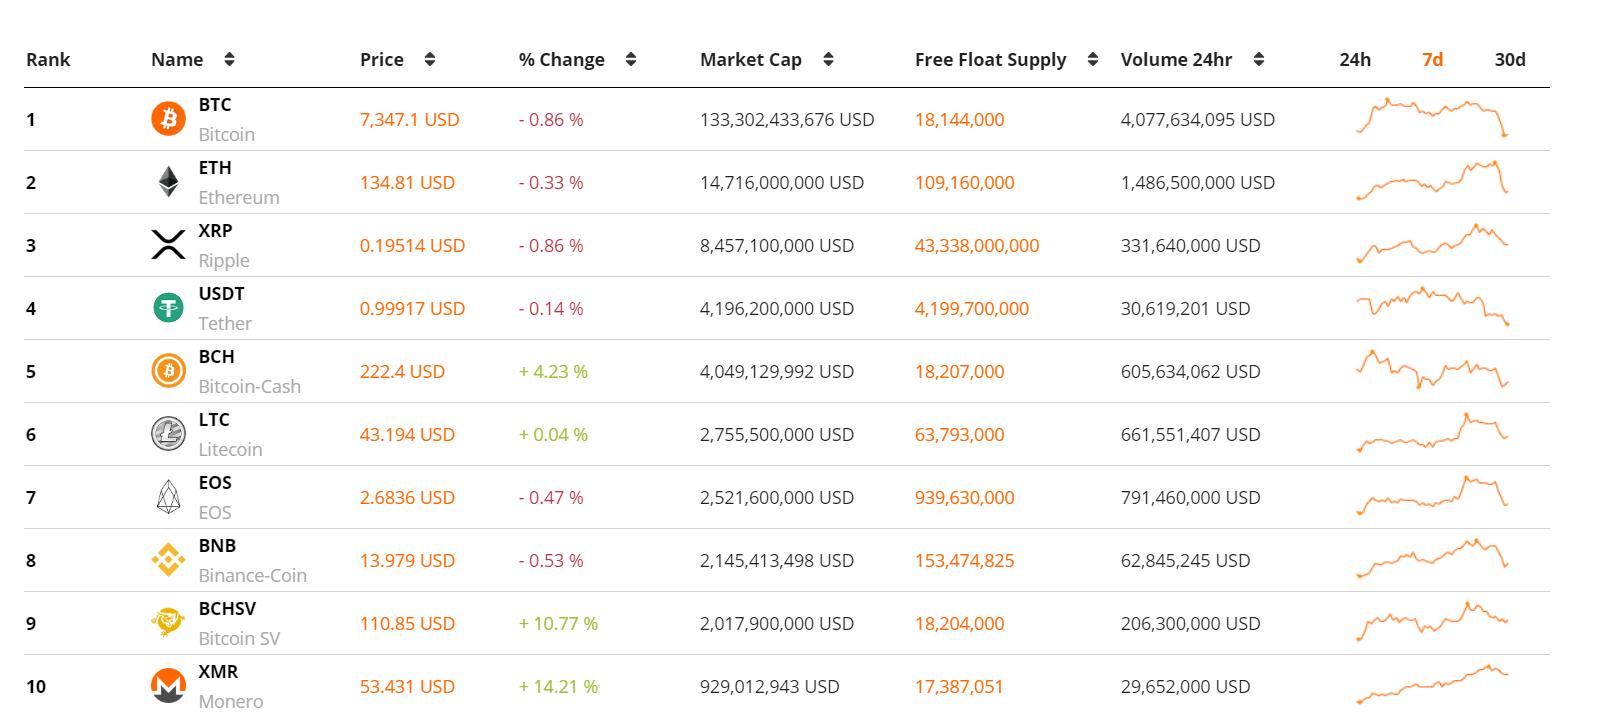 aragon cryptocurrency price prediction